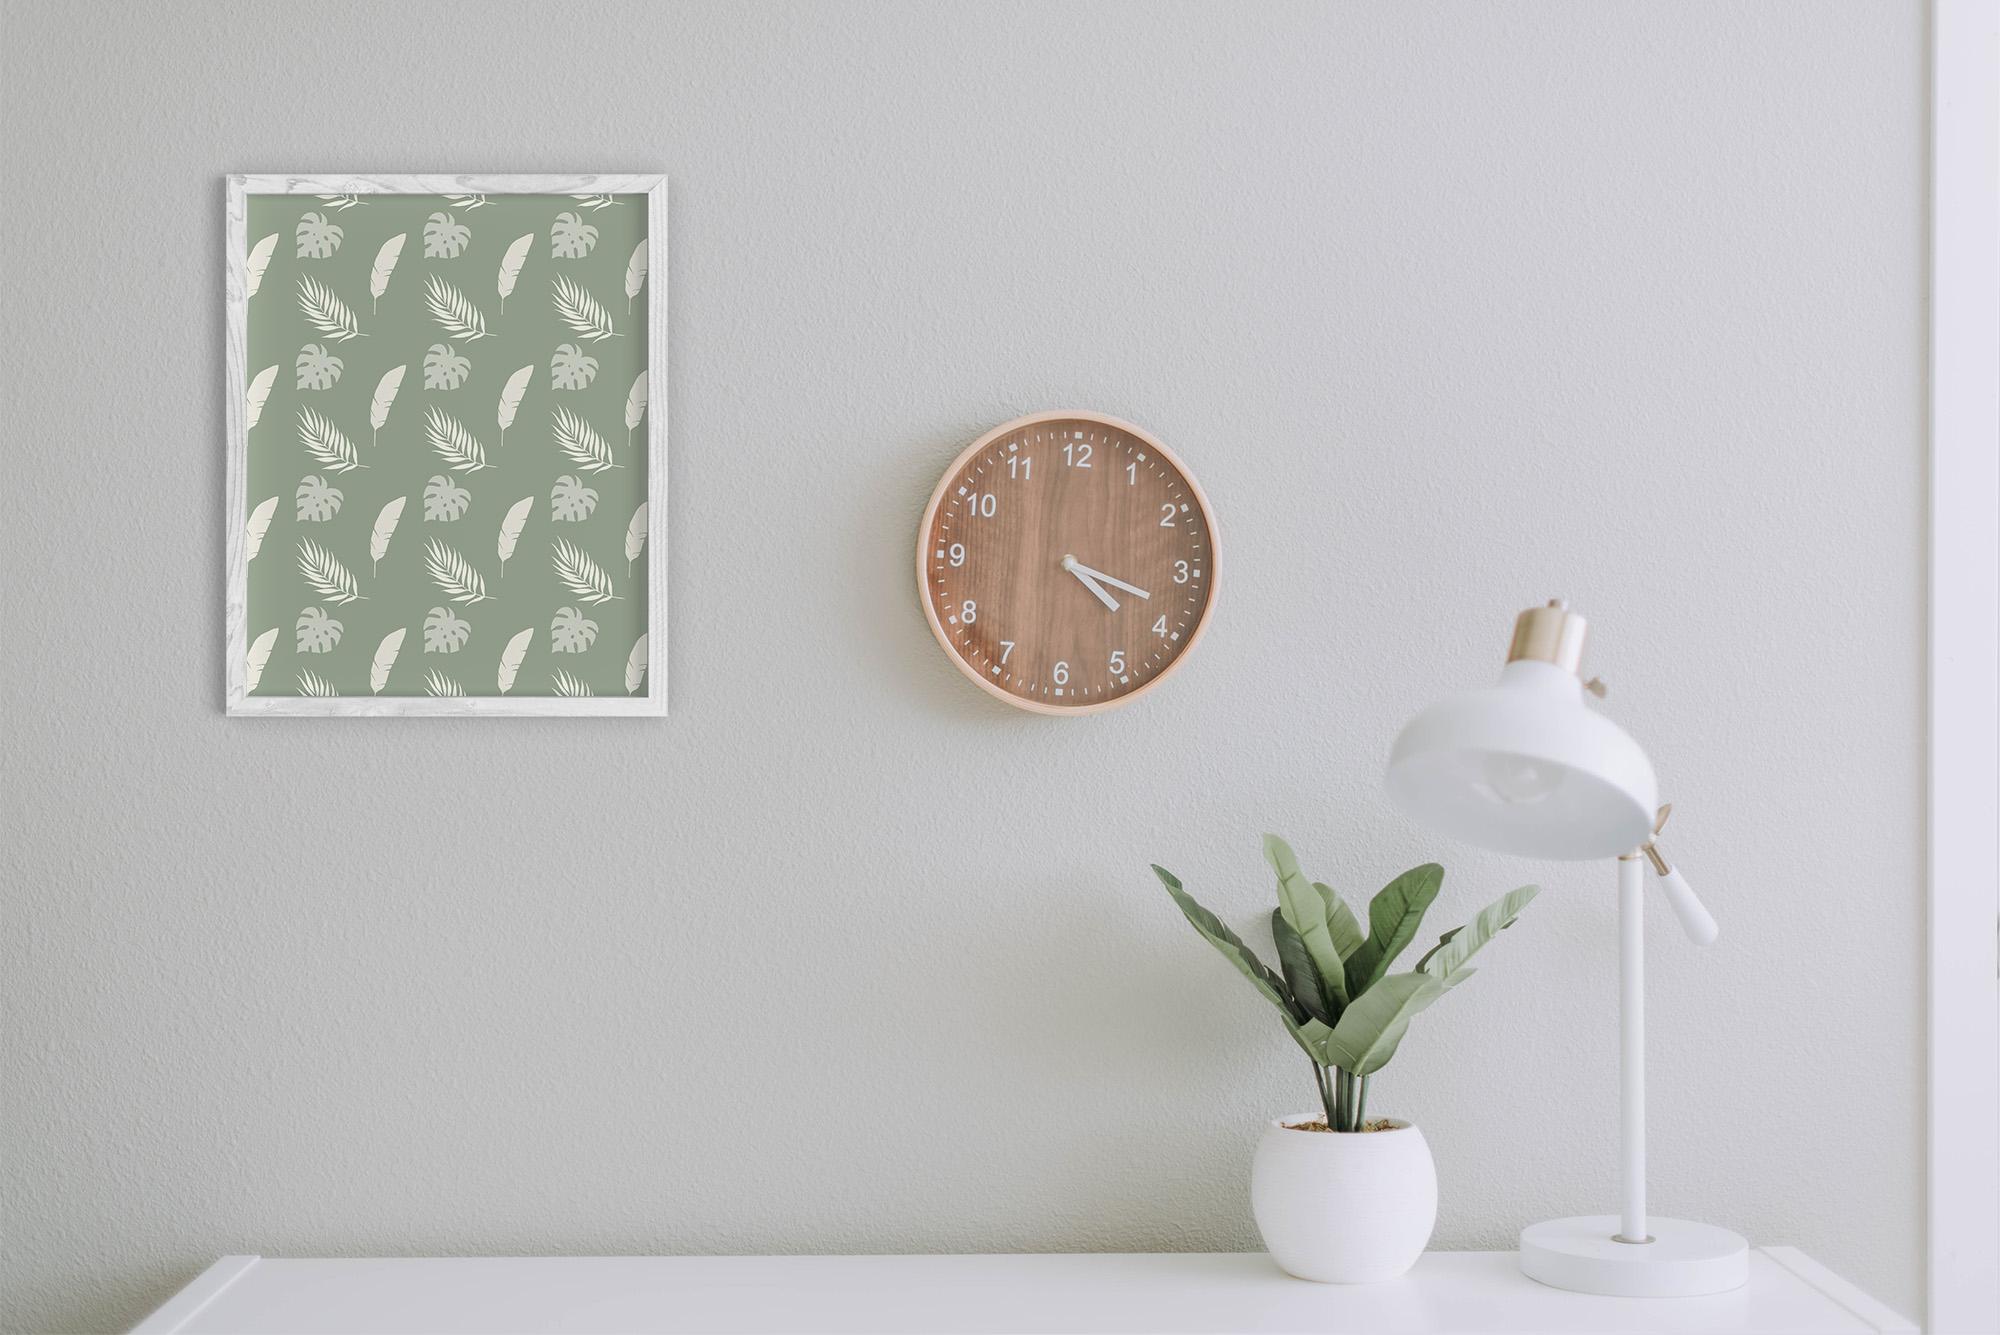 pattern-design-fpapier-peint-feuillage-graphiste-oise